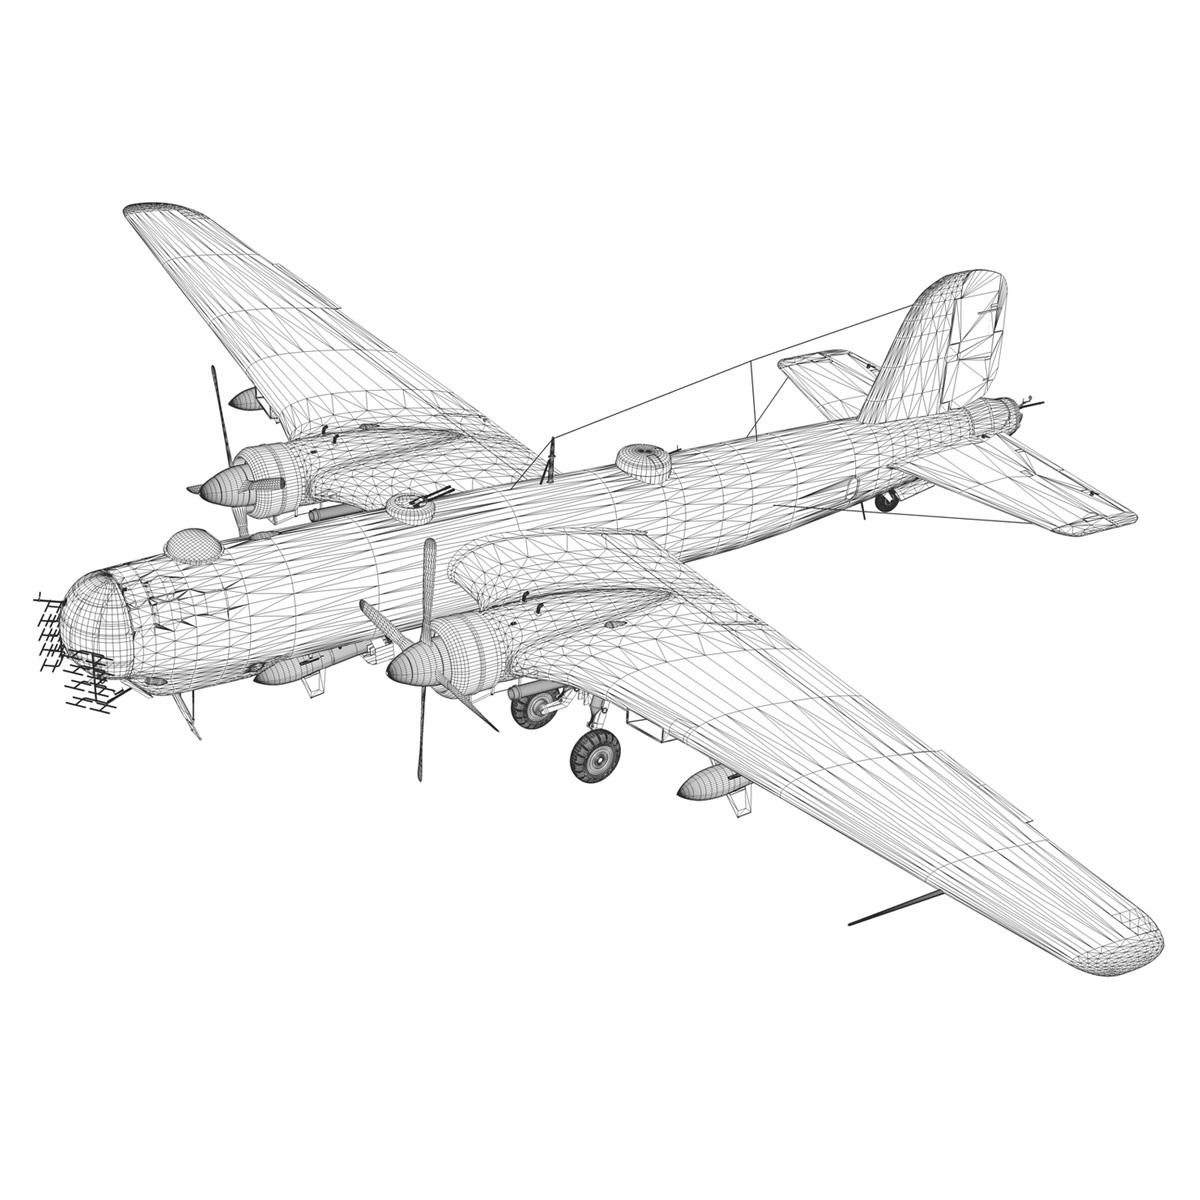 heinkel he-177 a-5 – greif – 6ndn 3d model 3ds fbx c4d lwo obj 201598